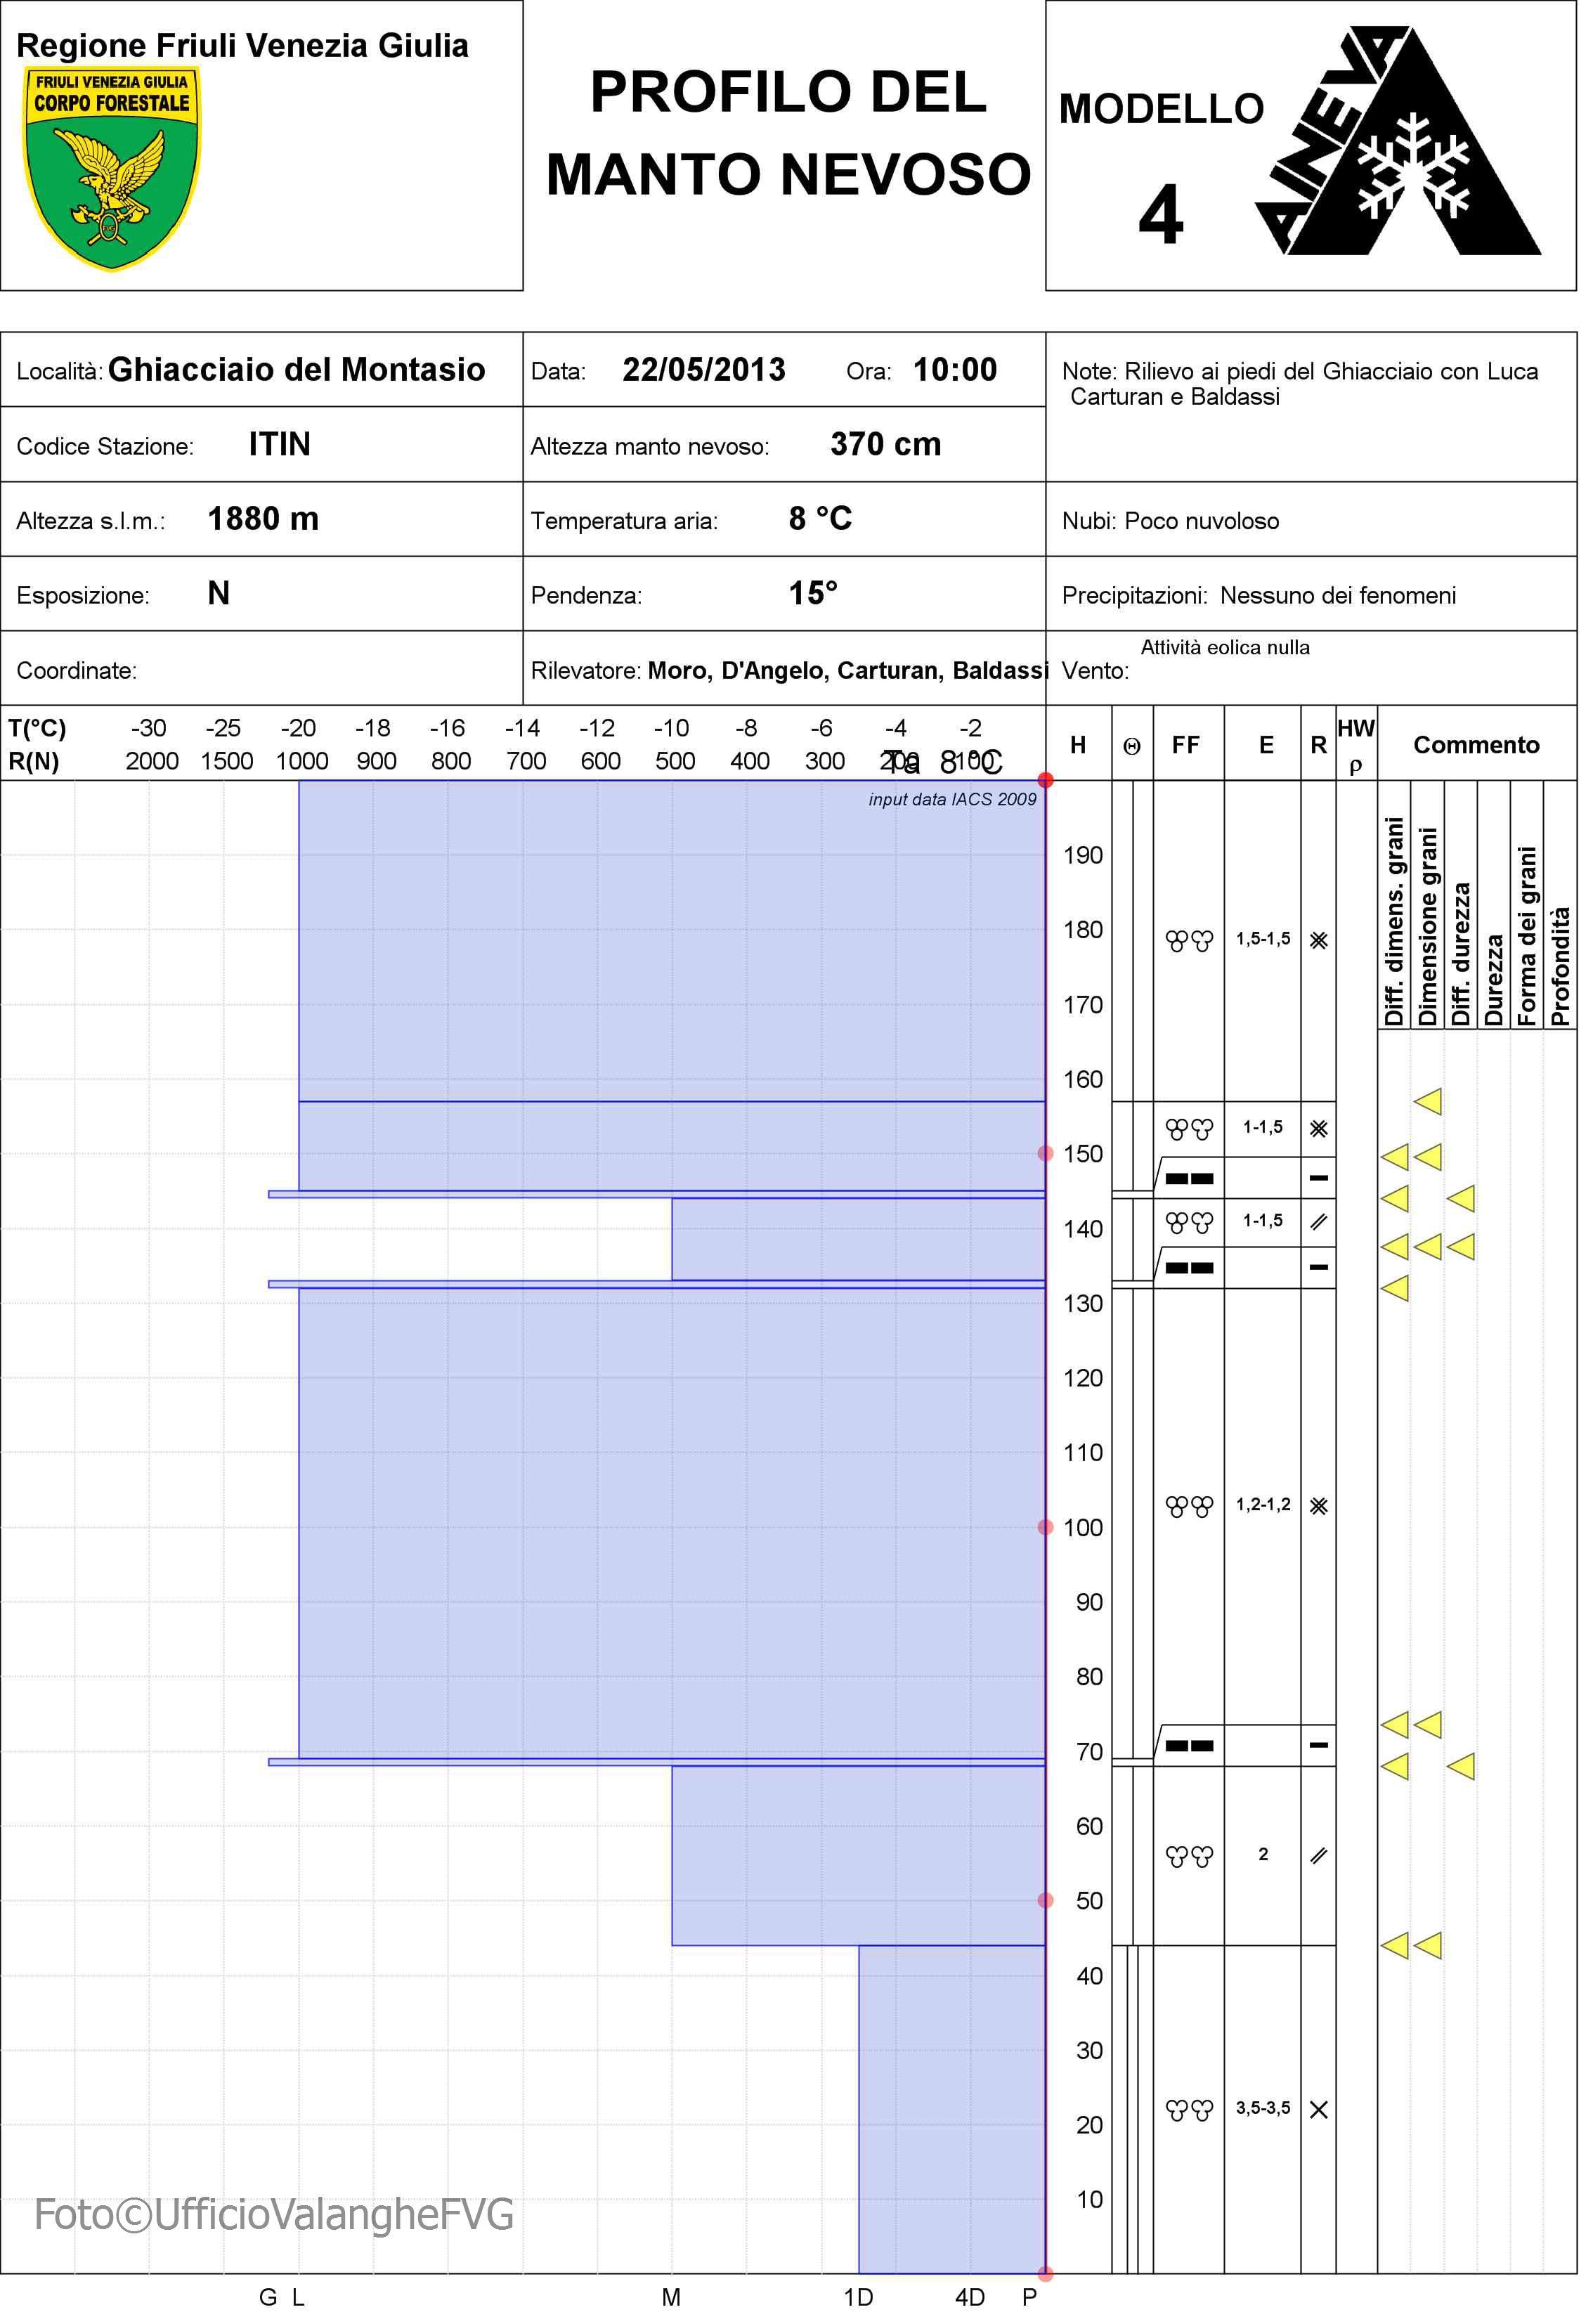 profilo primaverile ghiacciaio montasio 22-05-13.jpg.JPG